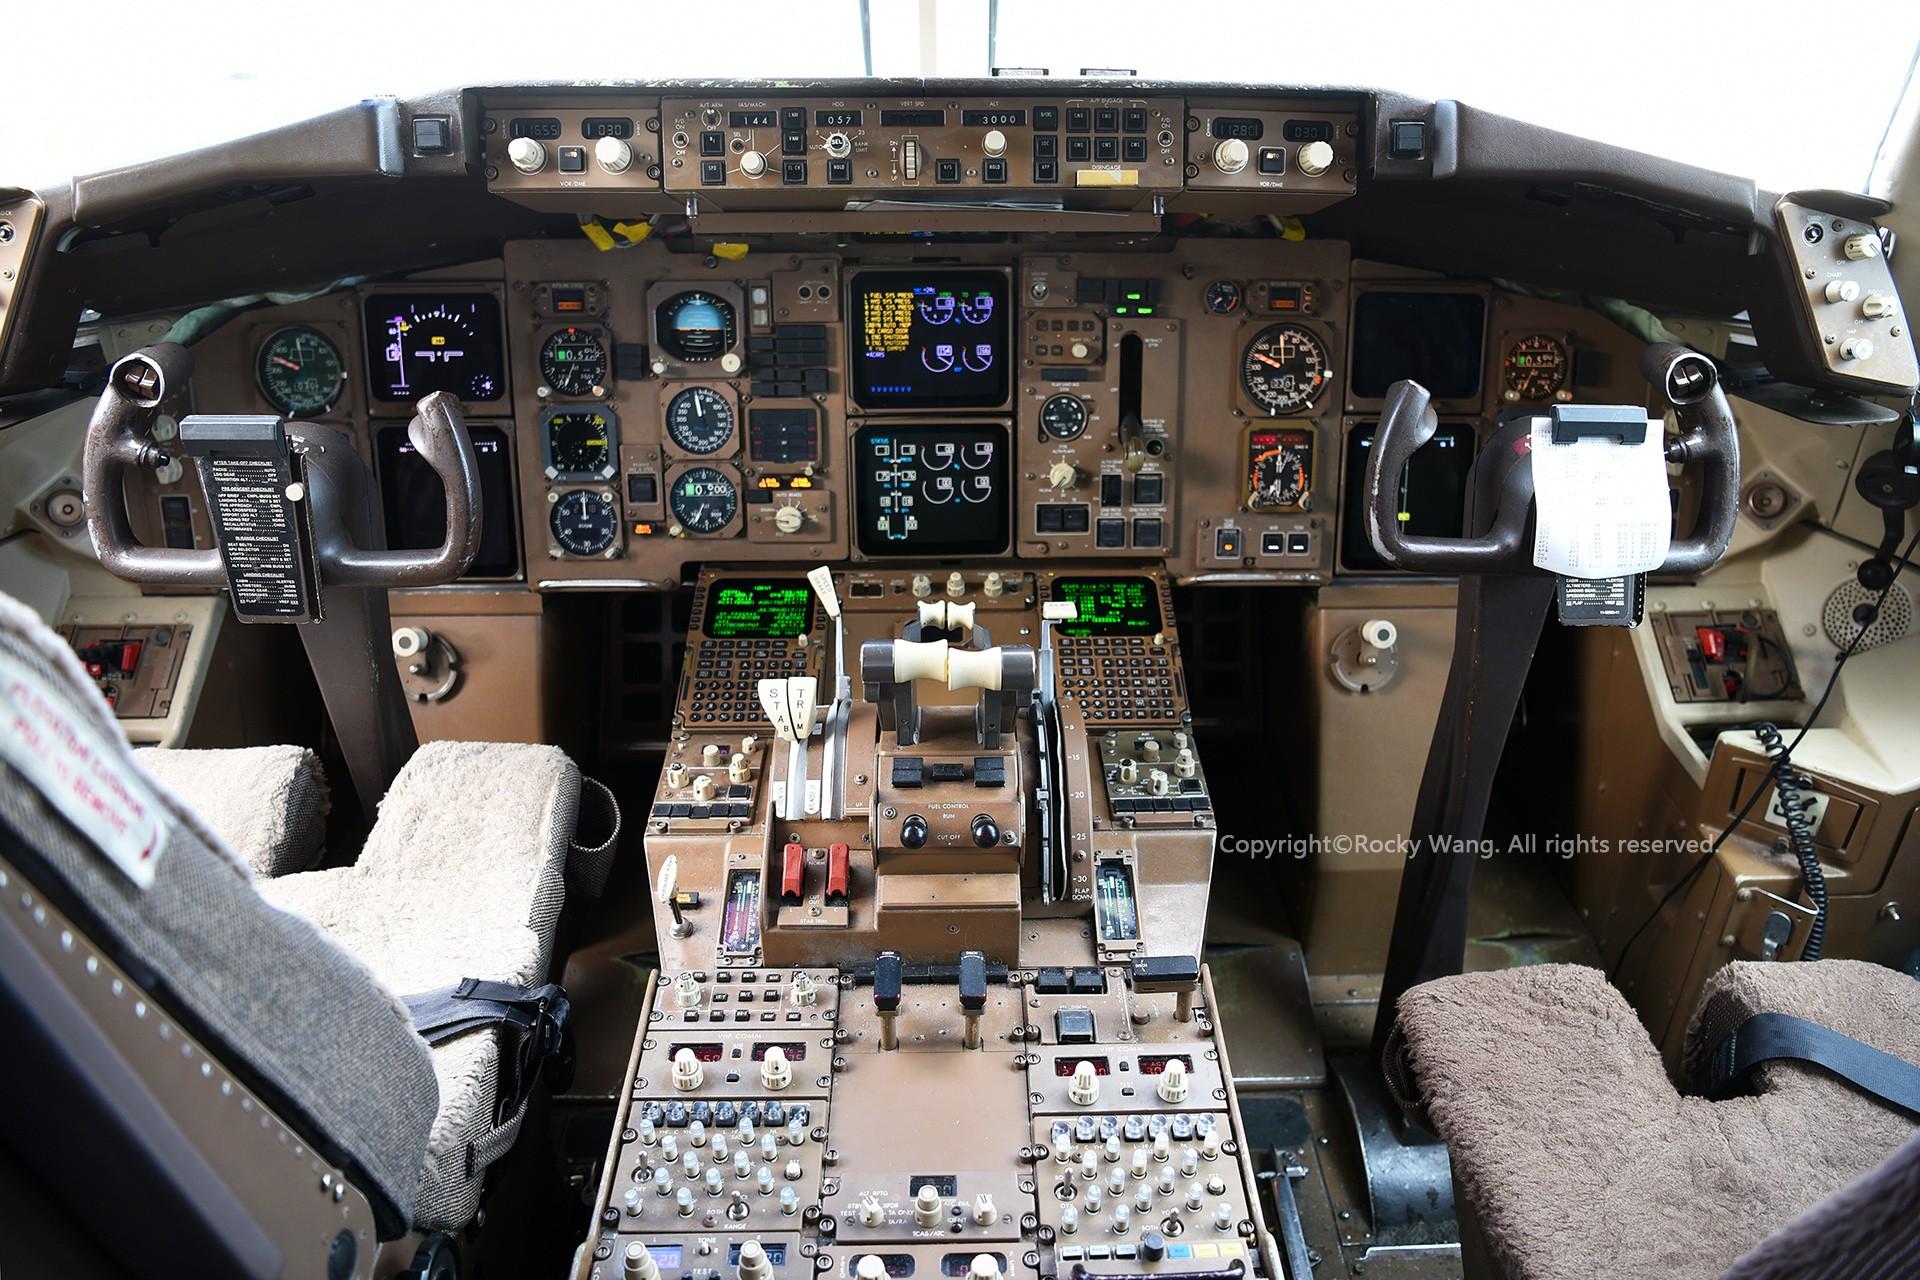 Re:[原创]简易版游记,纪念一次30段的环球飞行和一些碎碎念 BOEING 767-375(ER) C-FCAE Toronto Lester B. Pearson Int'l Airport